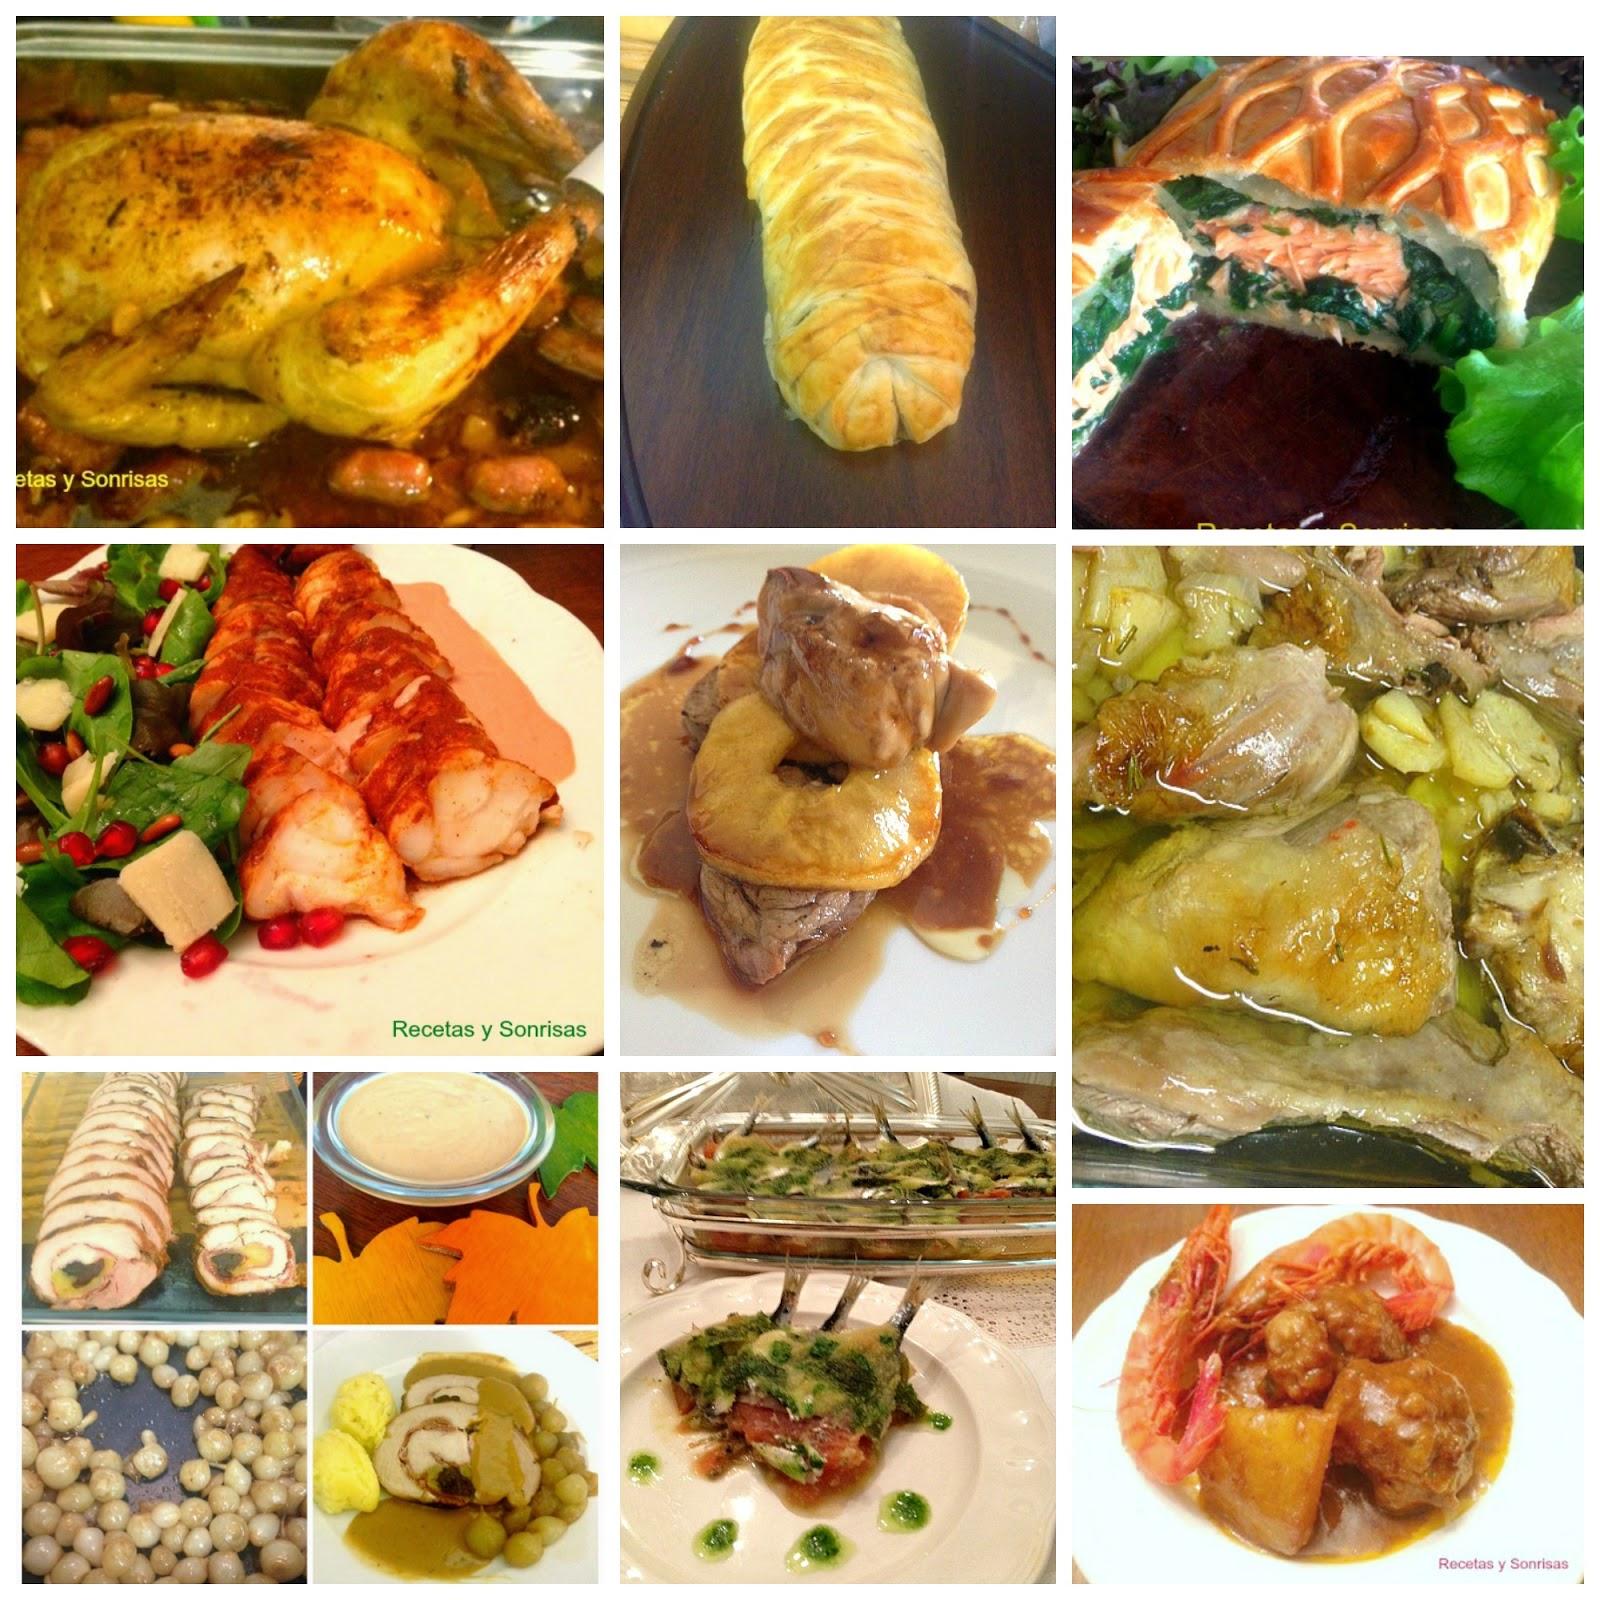 recetas de segundos platos para verano